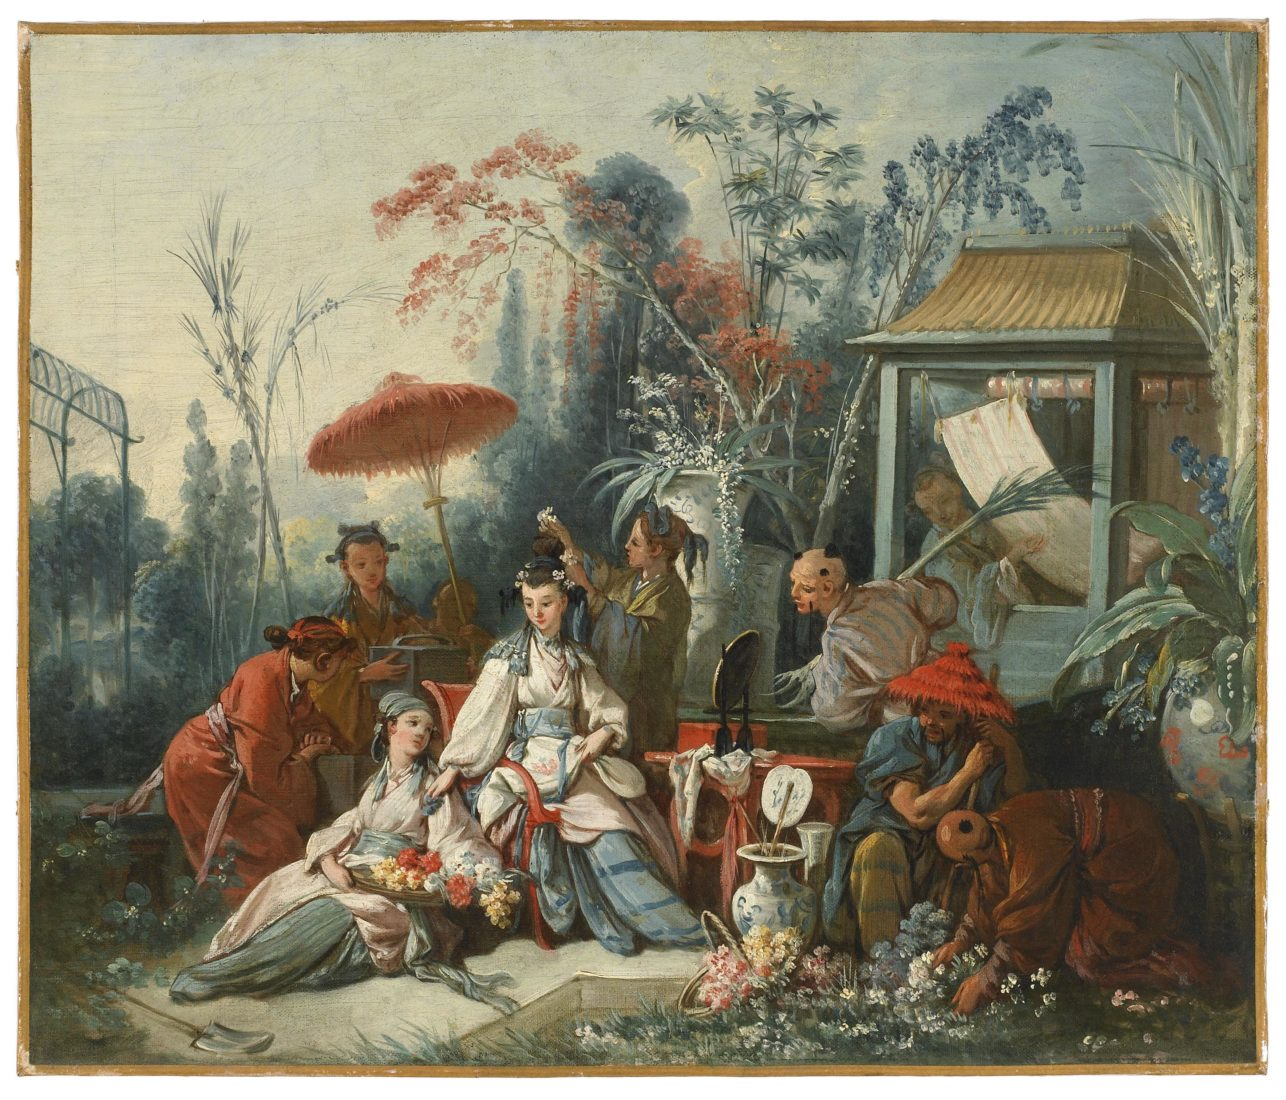 mbaa Besançon François BOUCHER, Le Jardin chinois